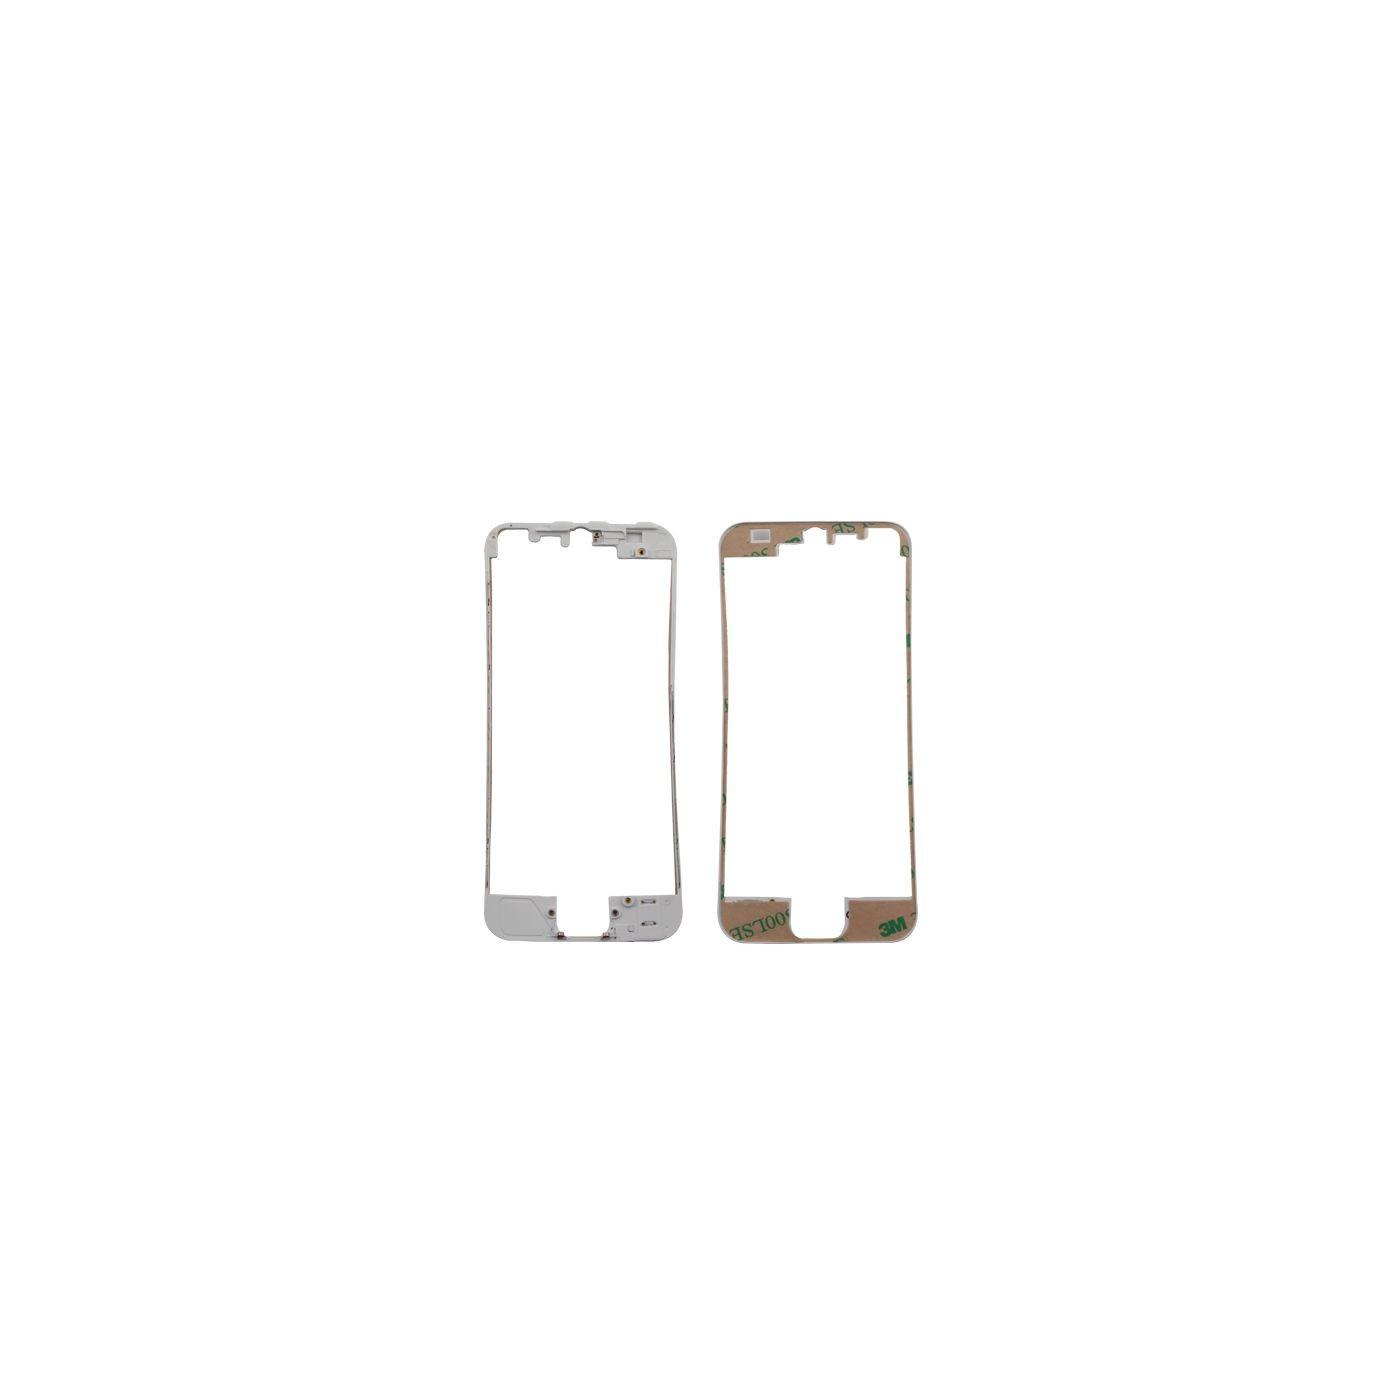 Marco de digitalizador de marco para iphone 5 blanco con etiqueta